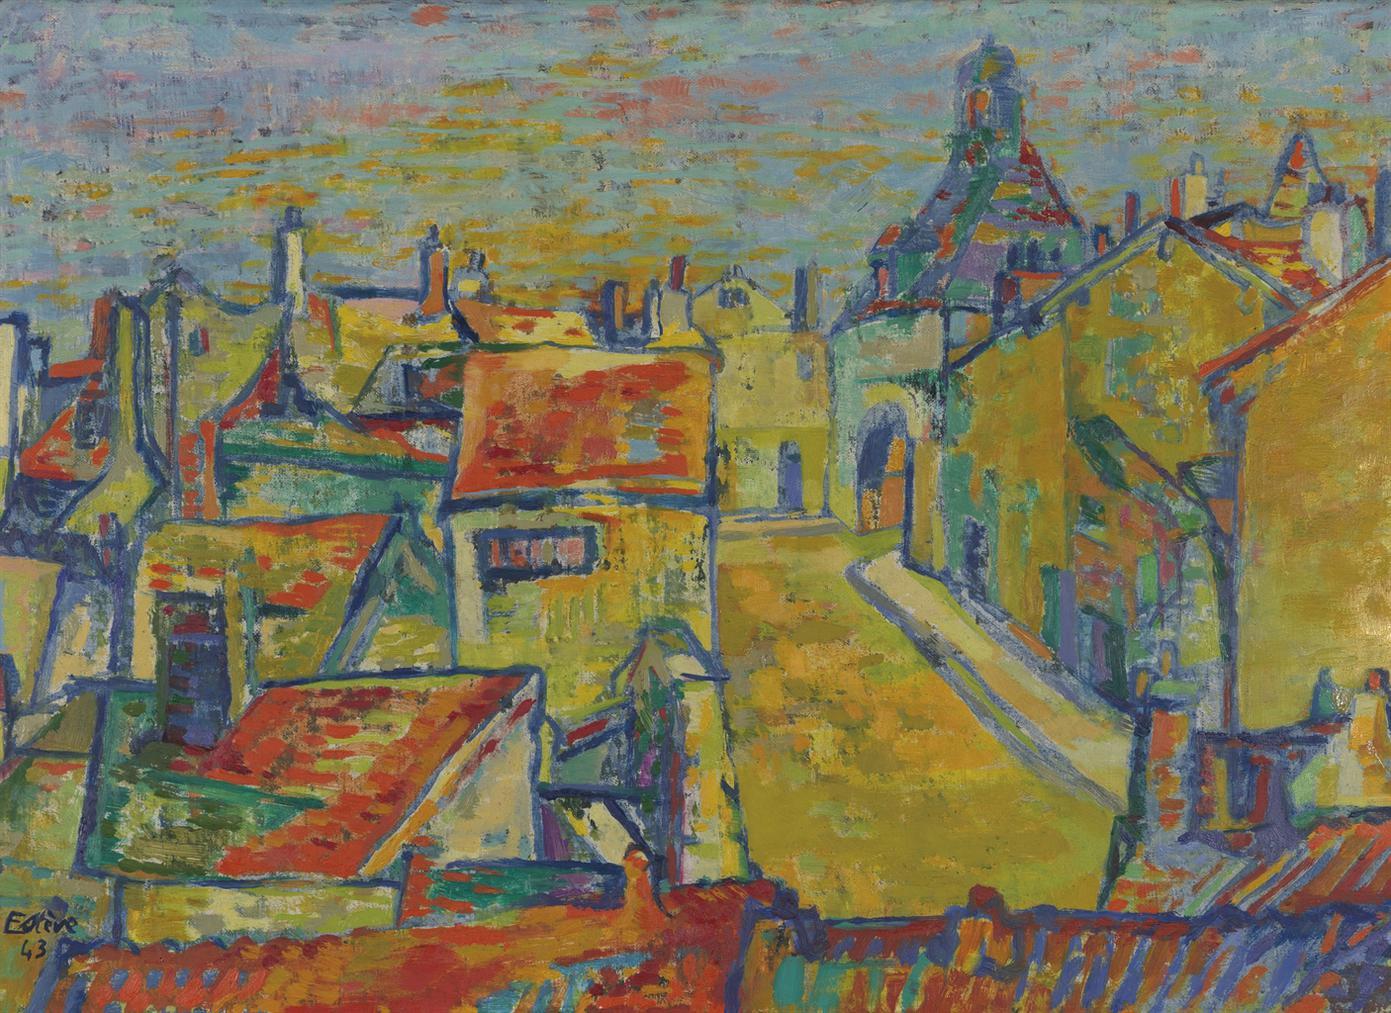 Maurice Esteve-Tournan-En-Brie-1943